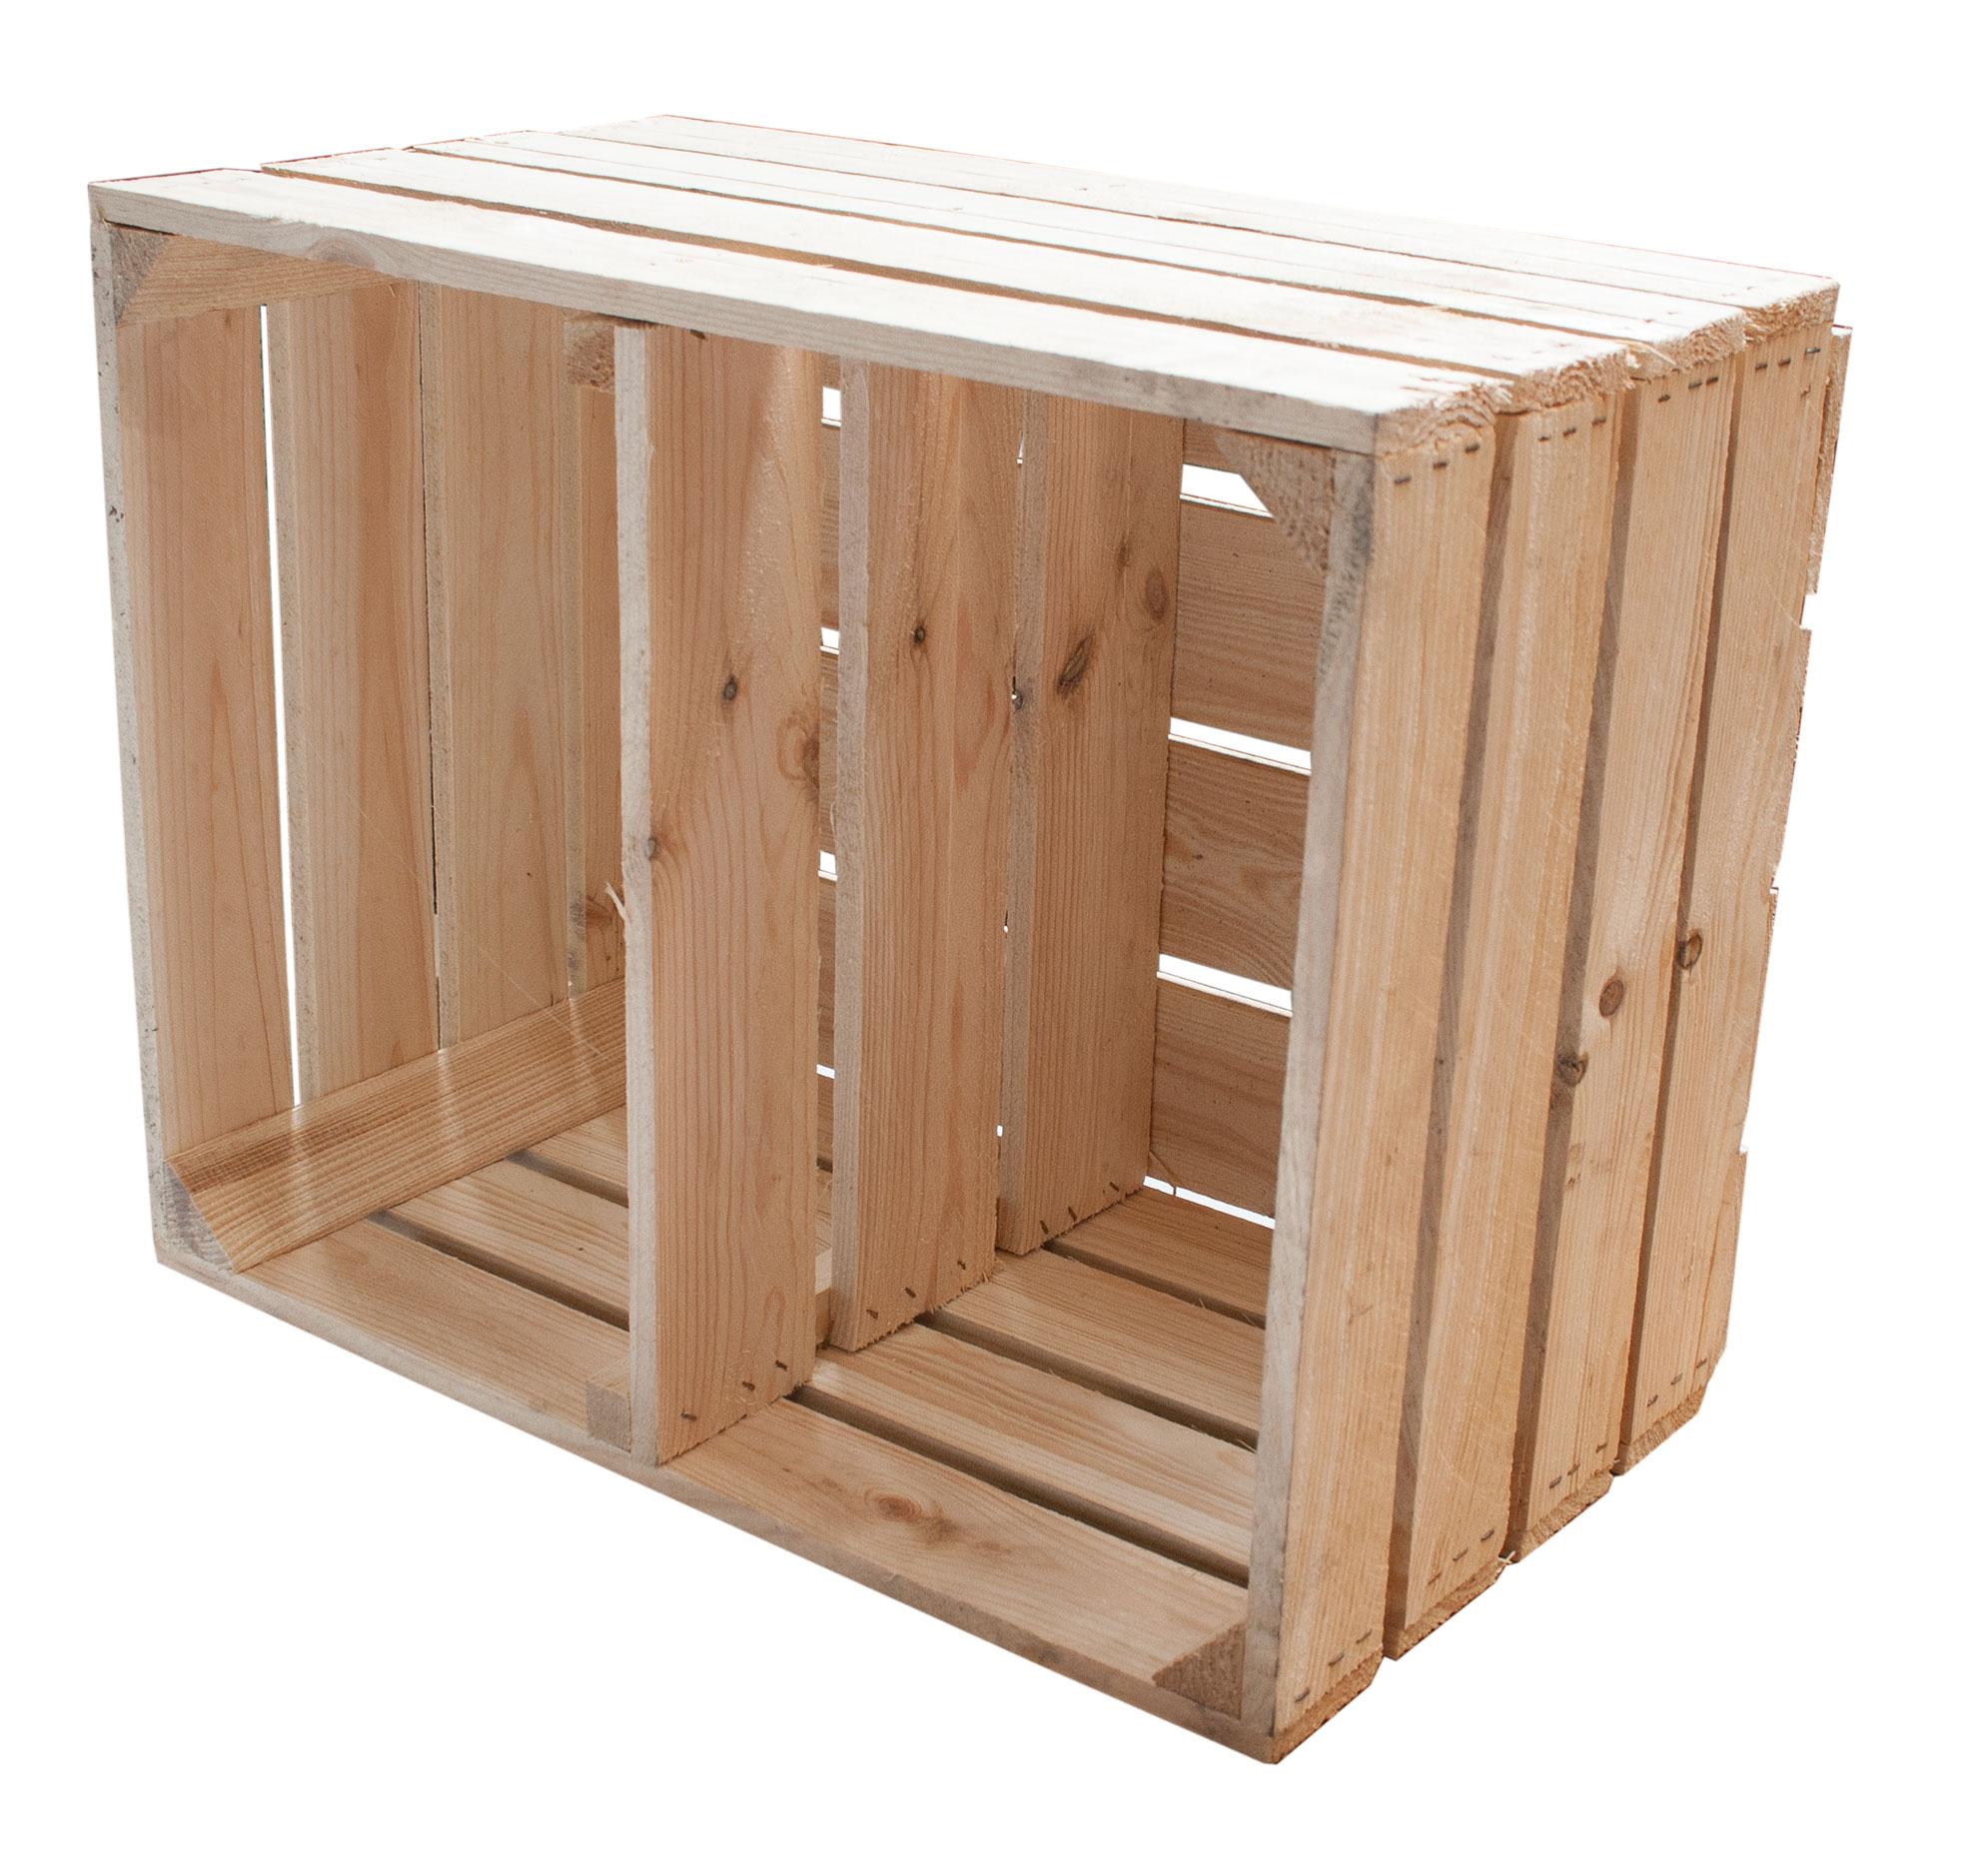 neue kisten regalkisten querboden natur 50x40x30cm. Black Bedroom Furniture Sets. Home Design Ideas